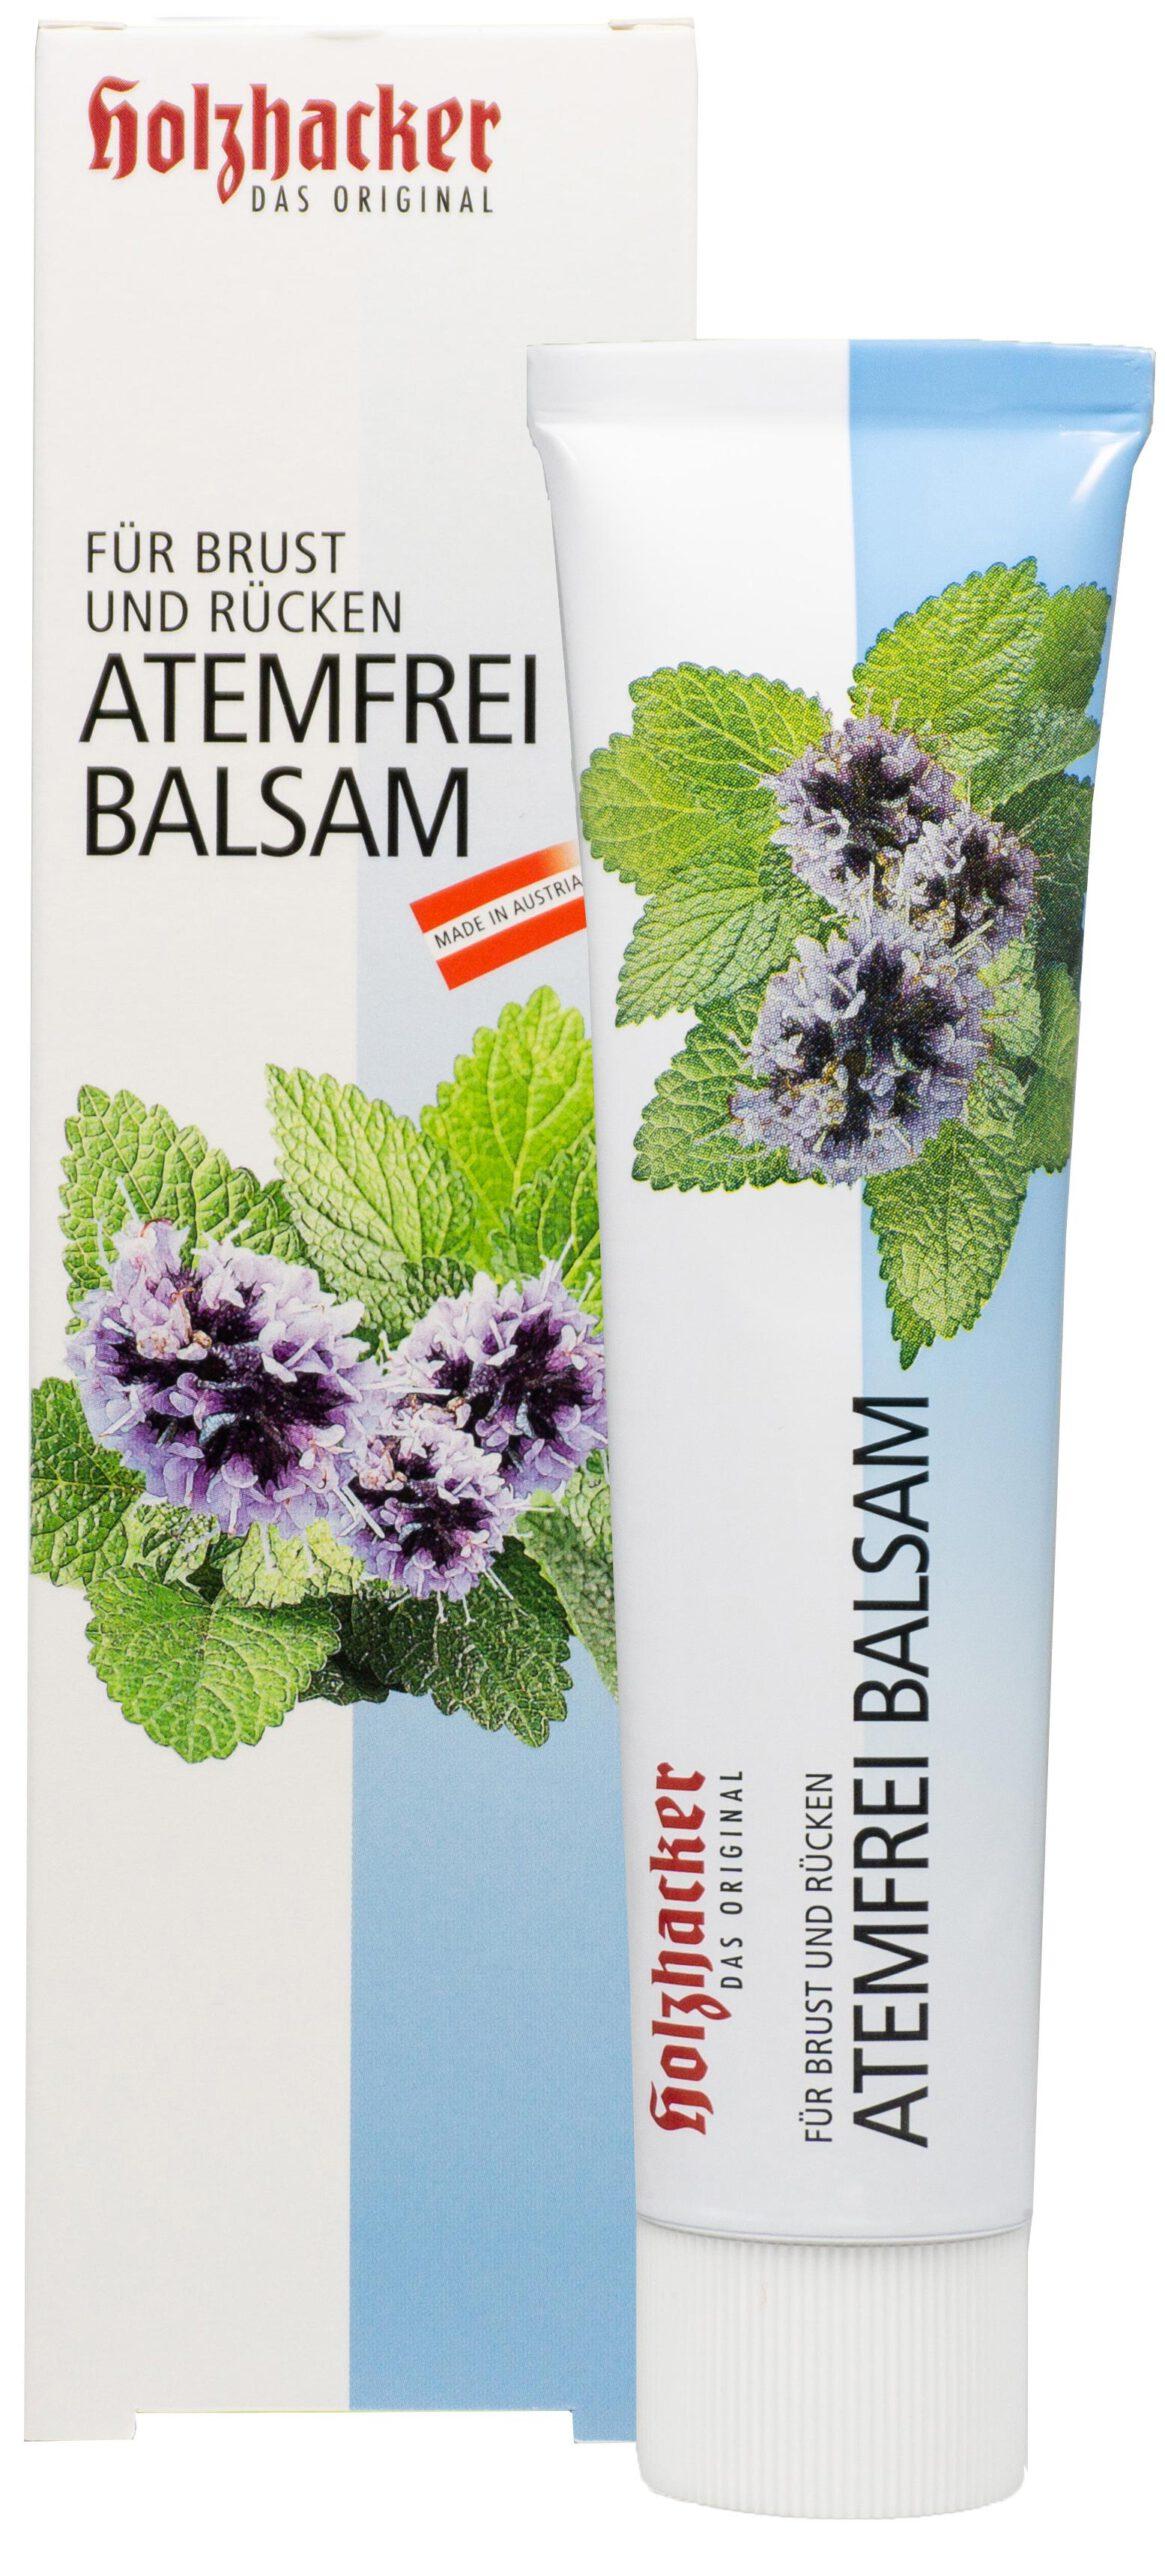 Atemfrei Balsam Image